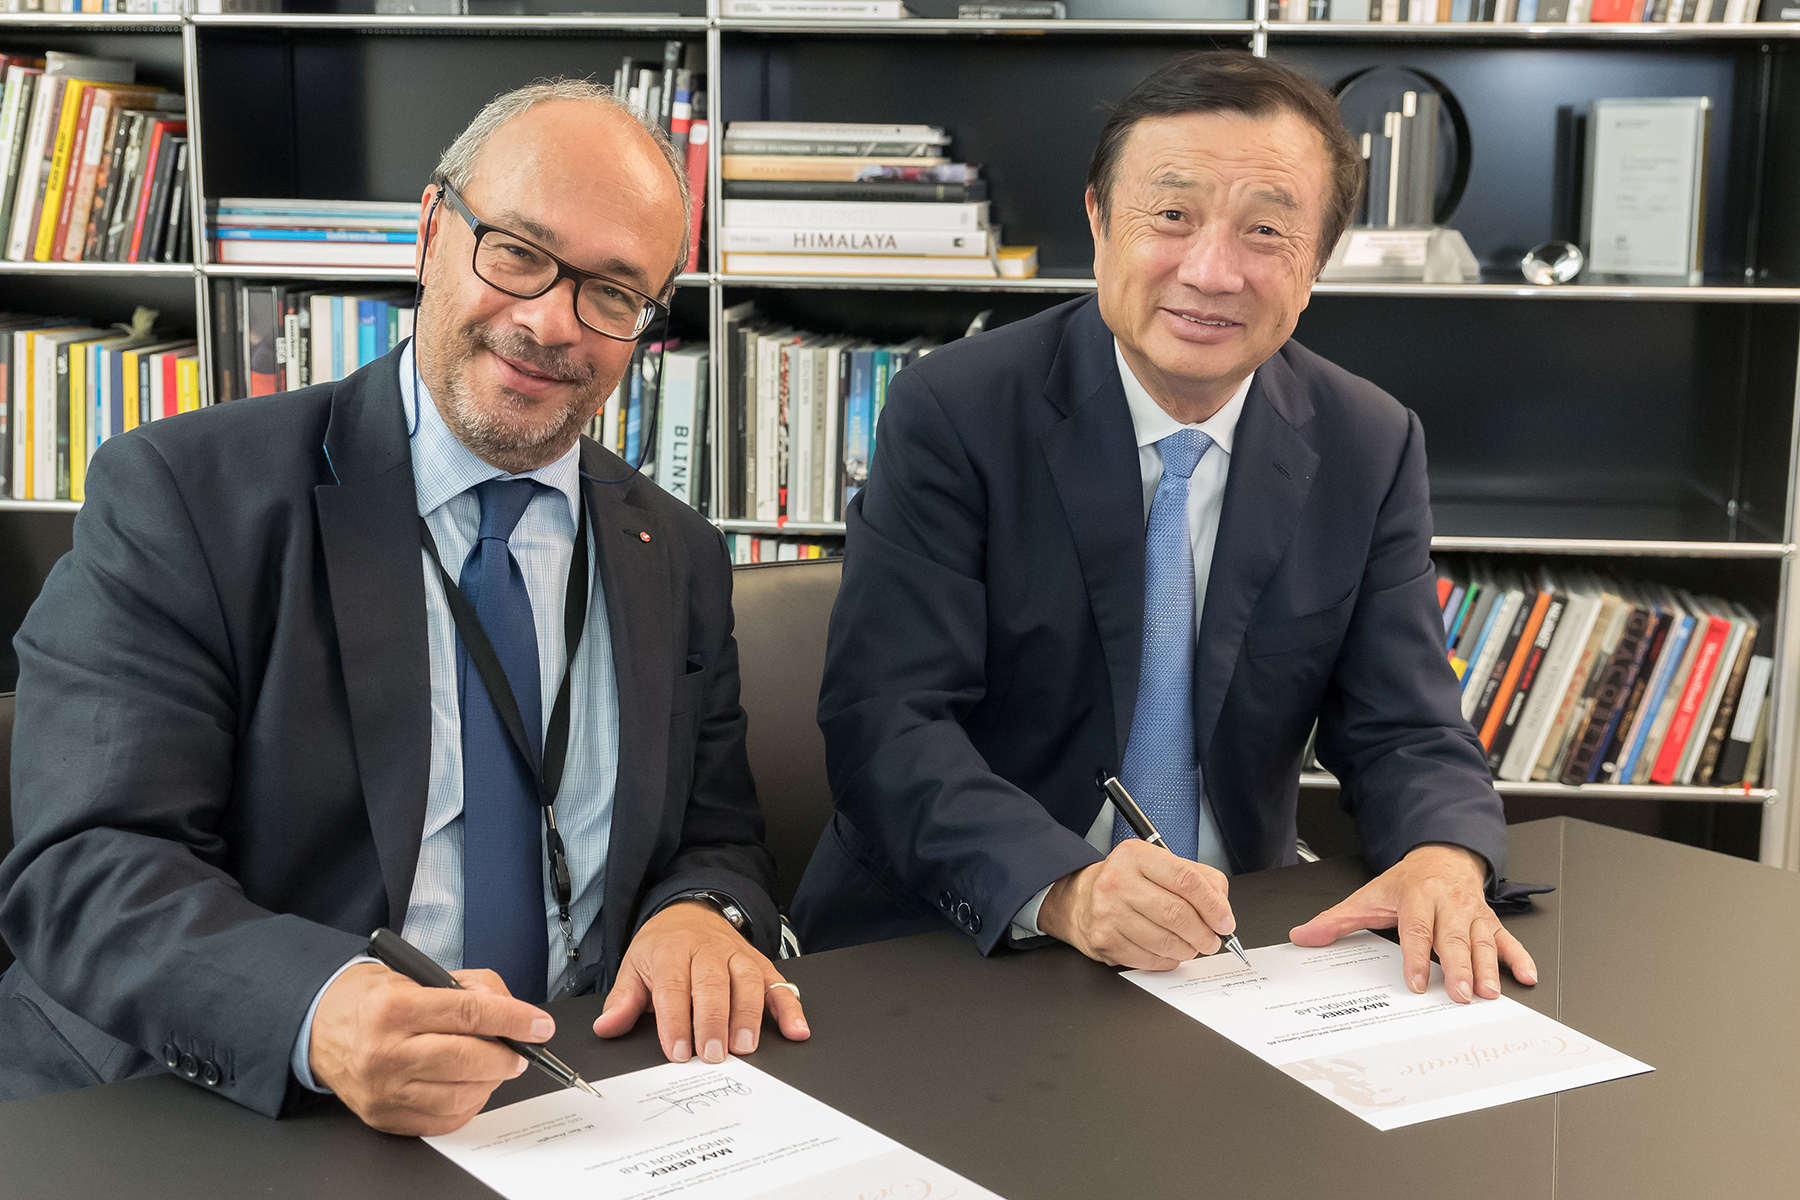 Huawei e Leica intenzionate a continuare la partnership